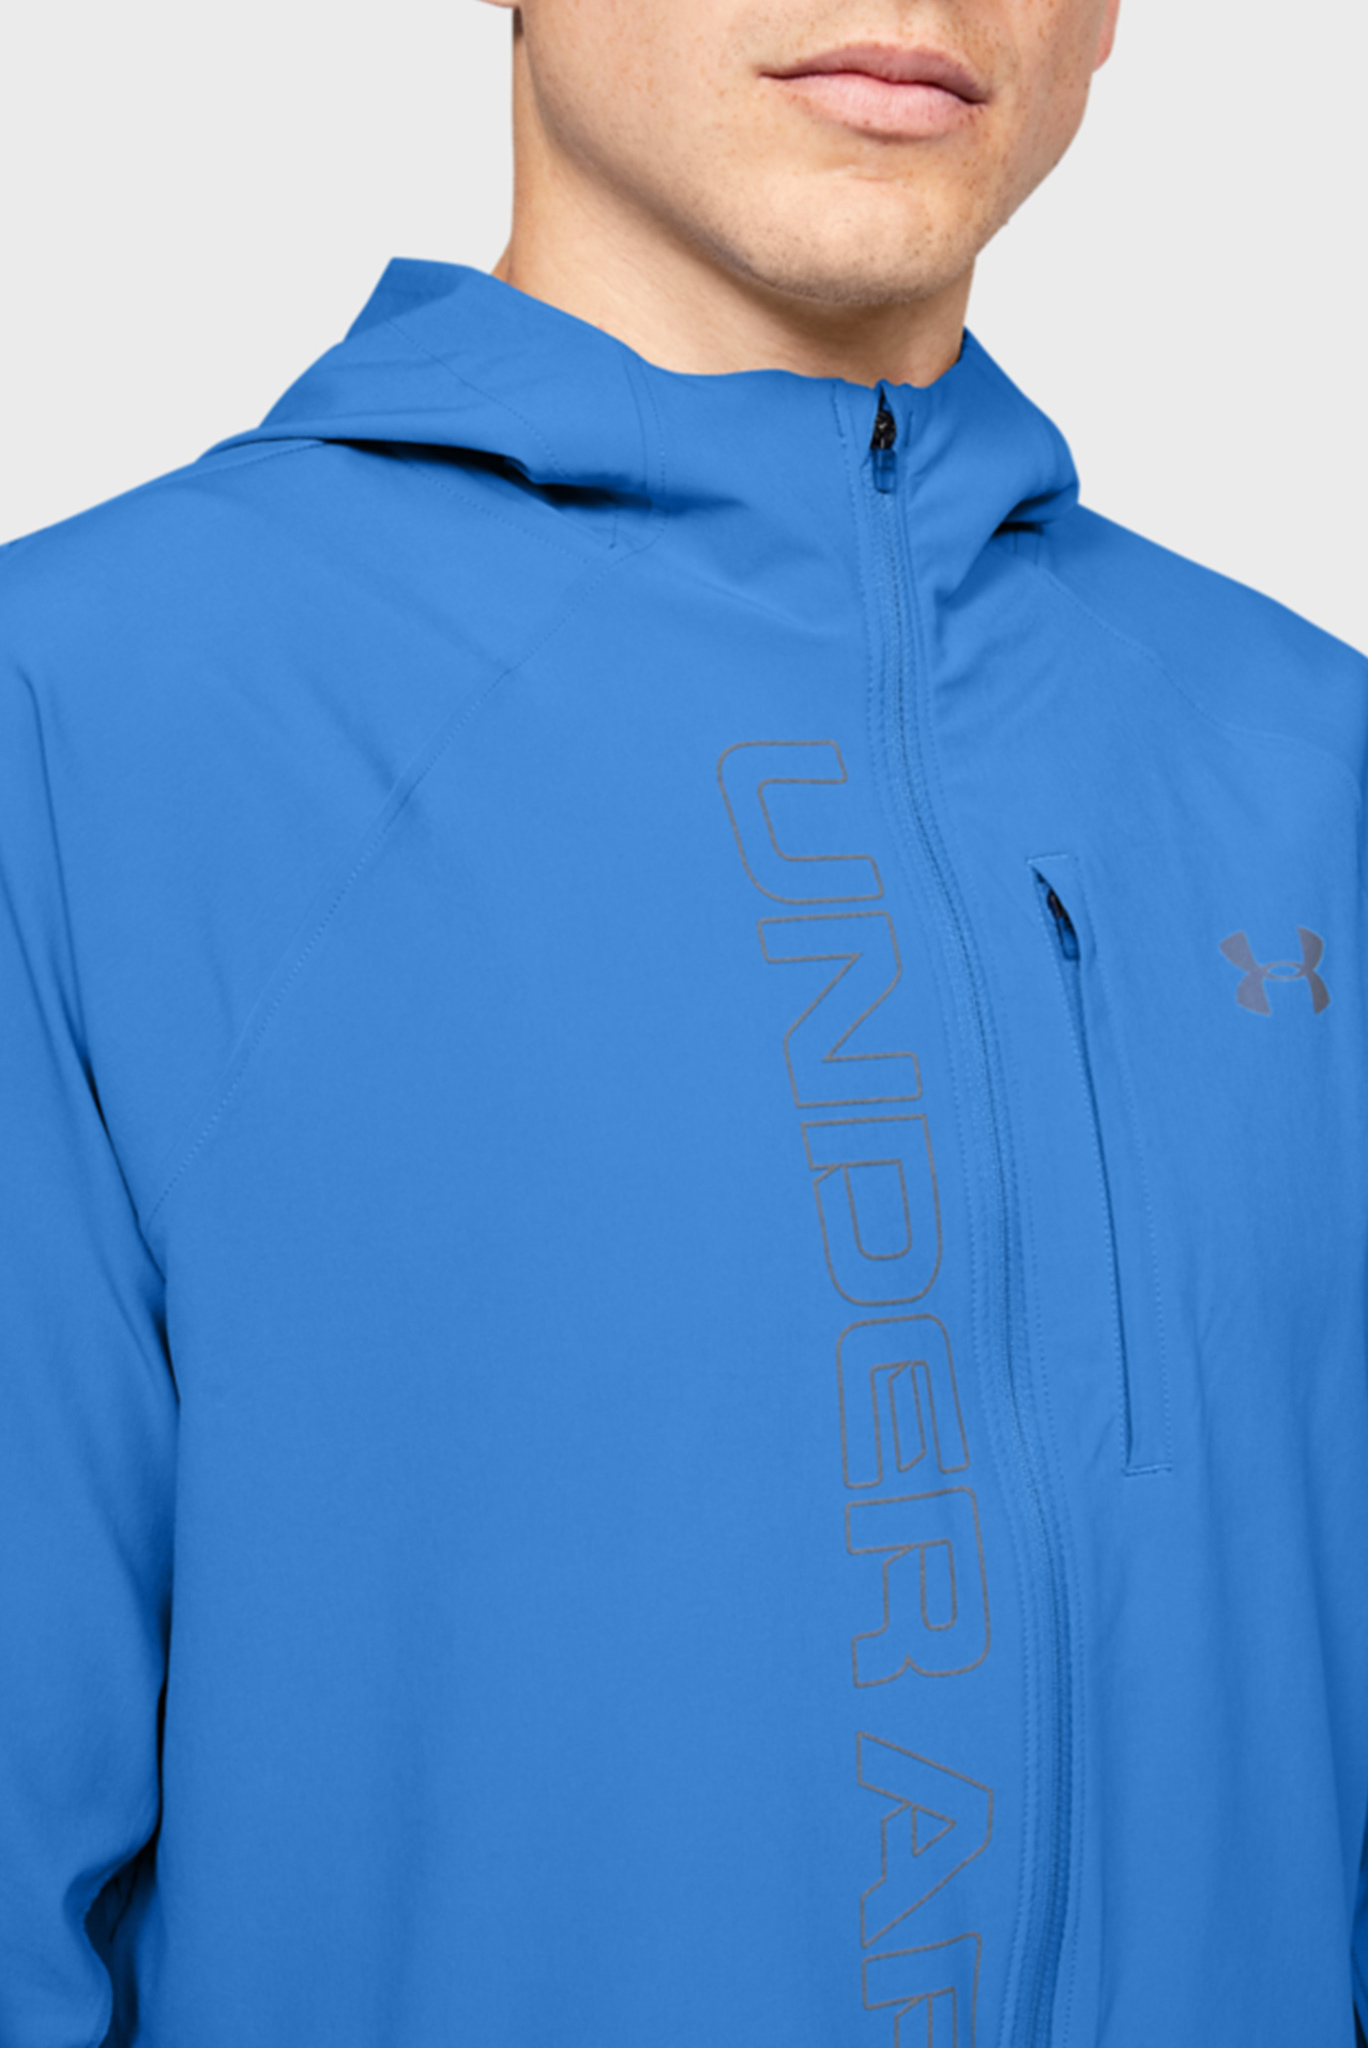 Мужская синяя ветровка M UA Qualifier OutRun the STORM Jacket Under Armour